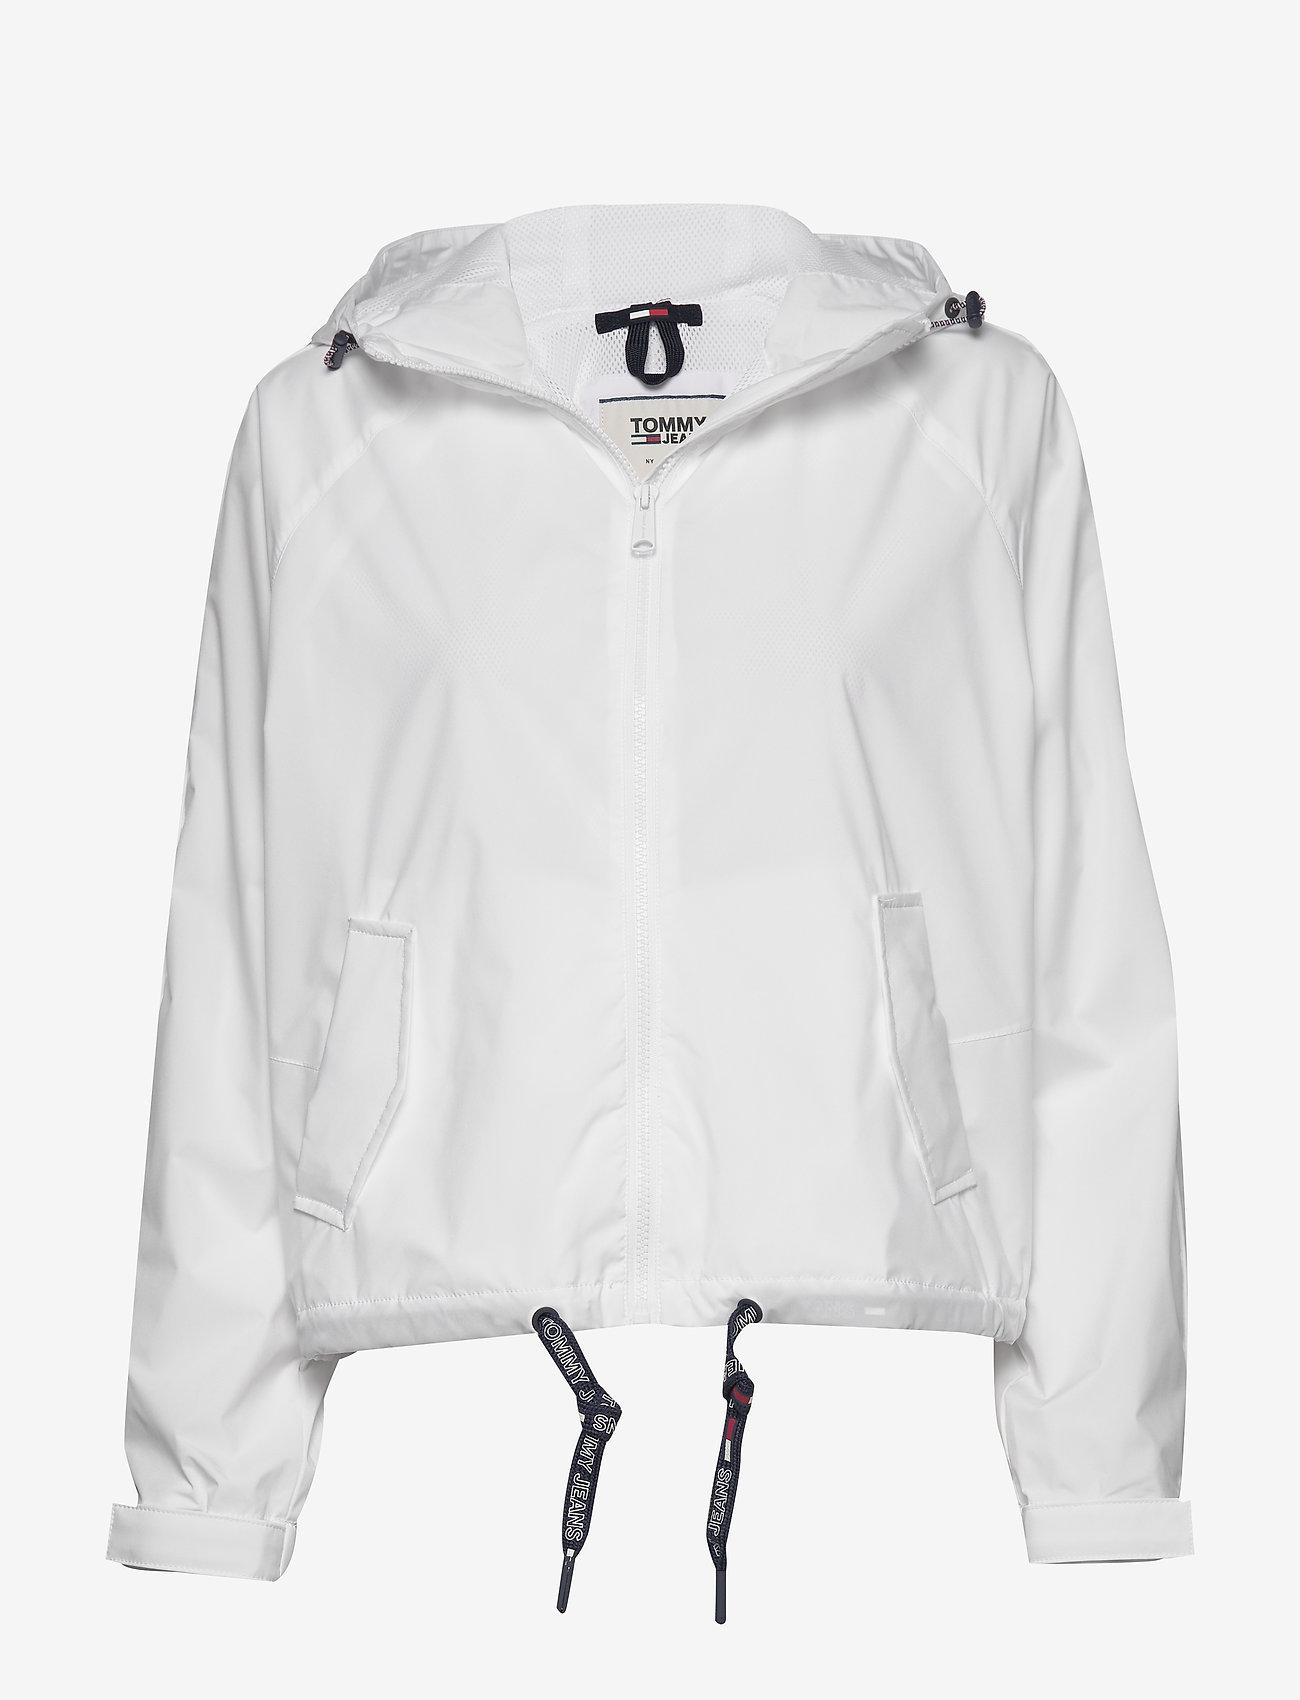 Tommy Jeans - TJW BRANDED SLEEVES WINDBREAKER - vestes legères - white - 0